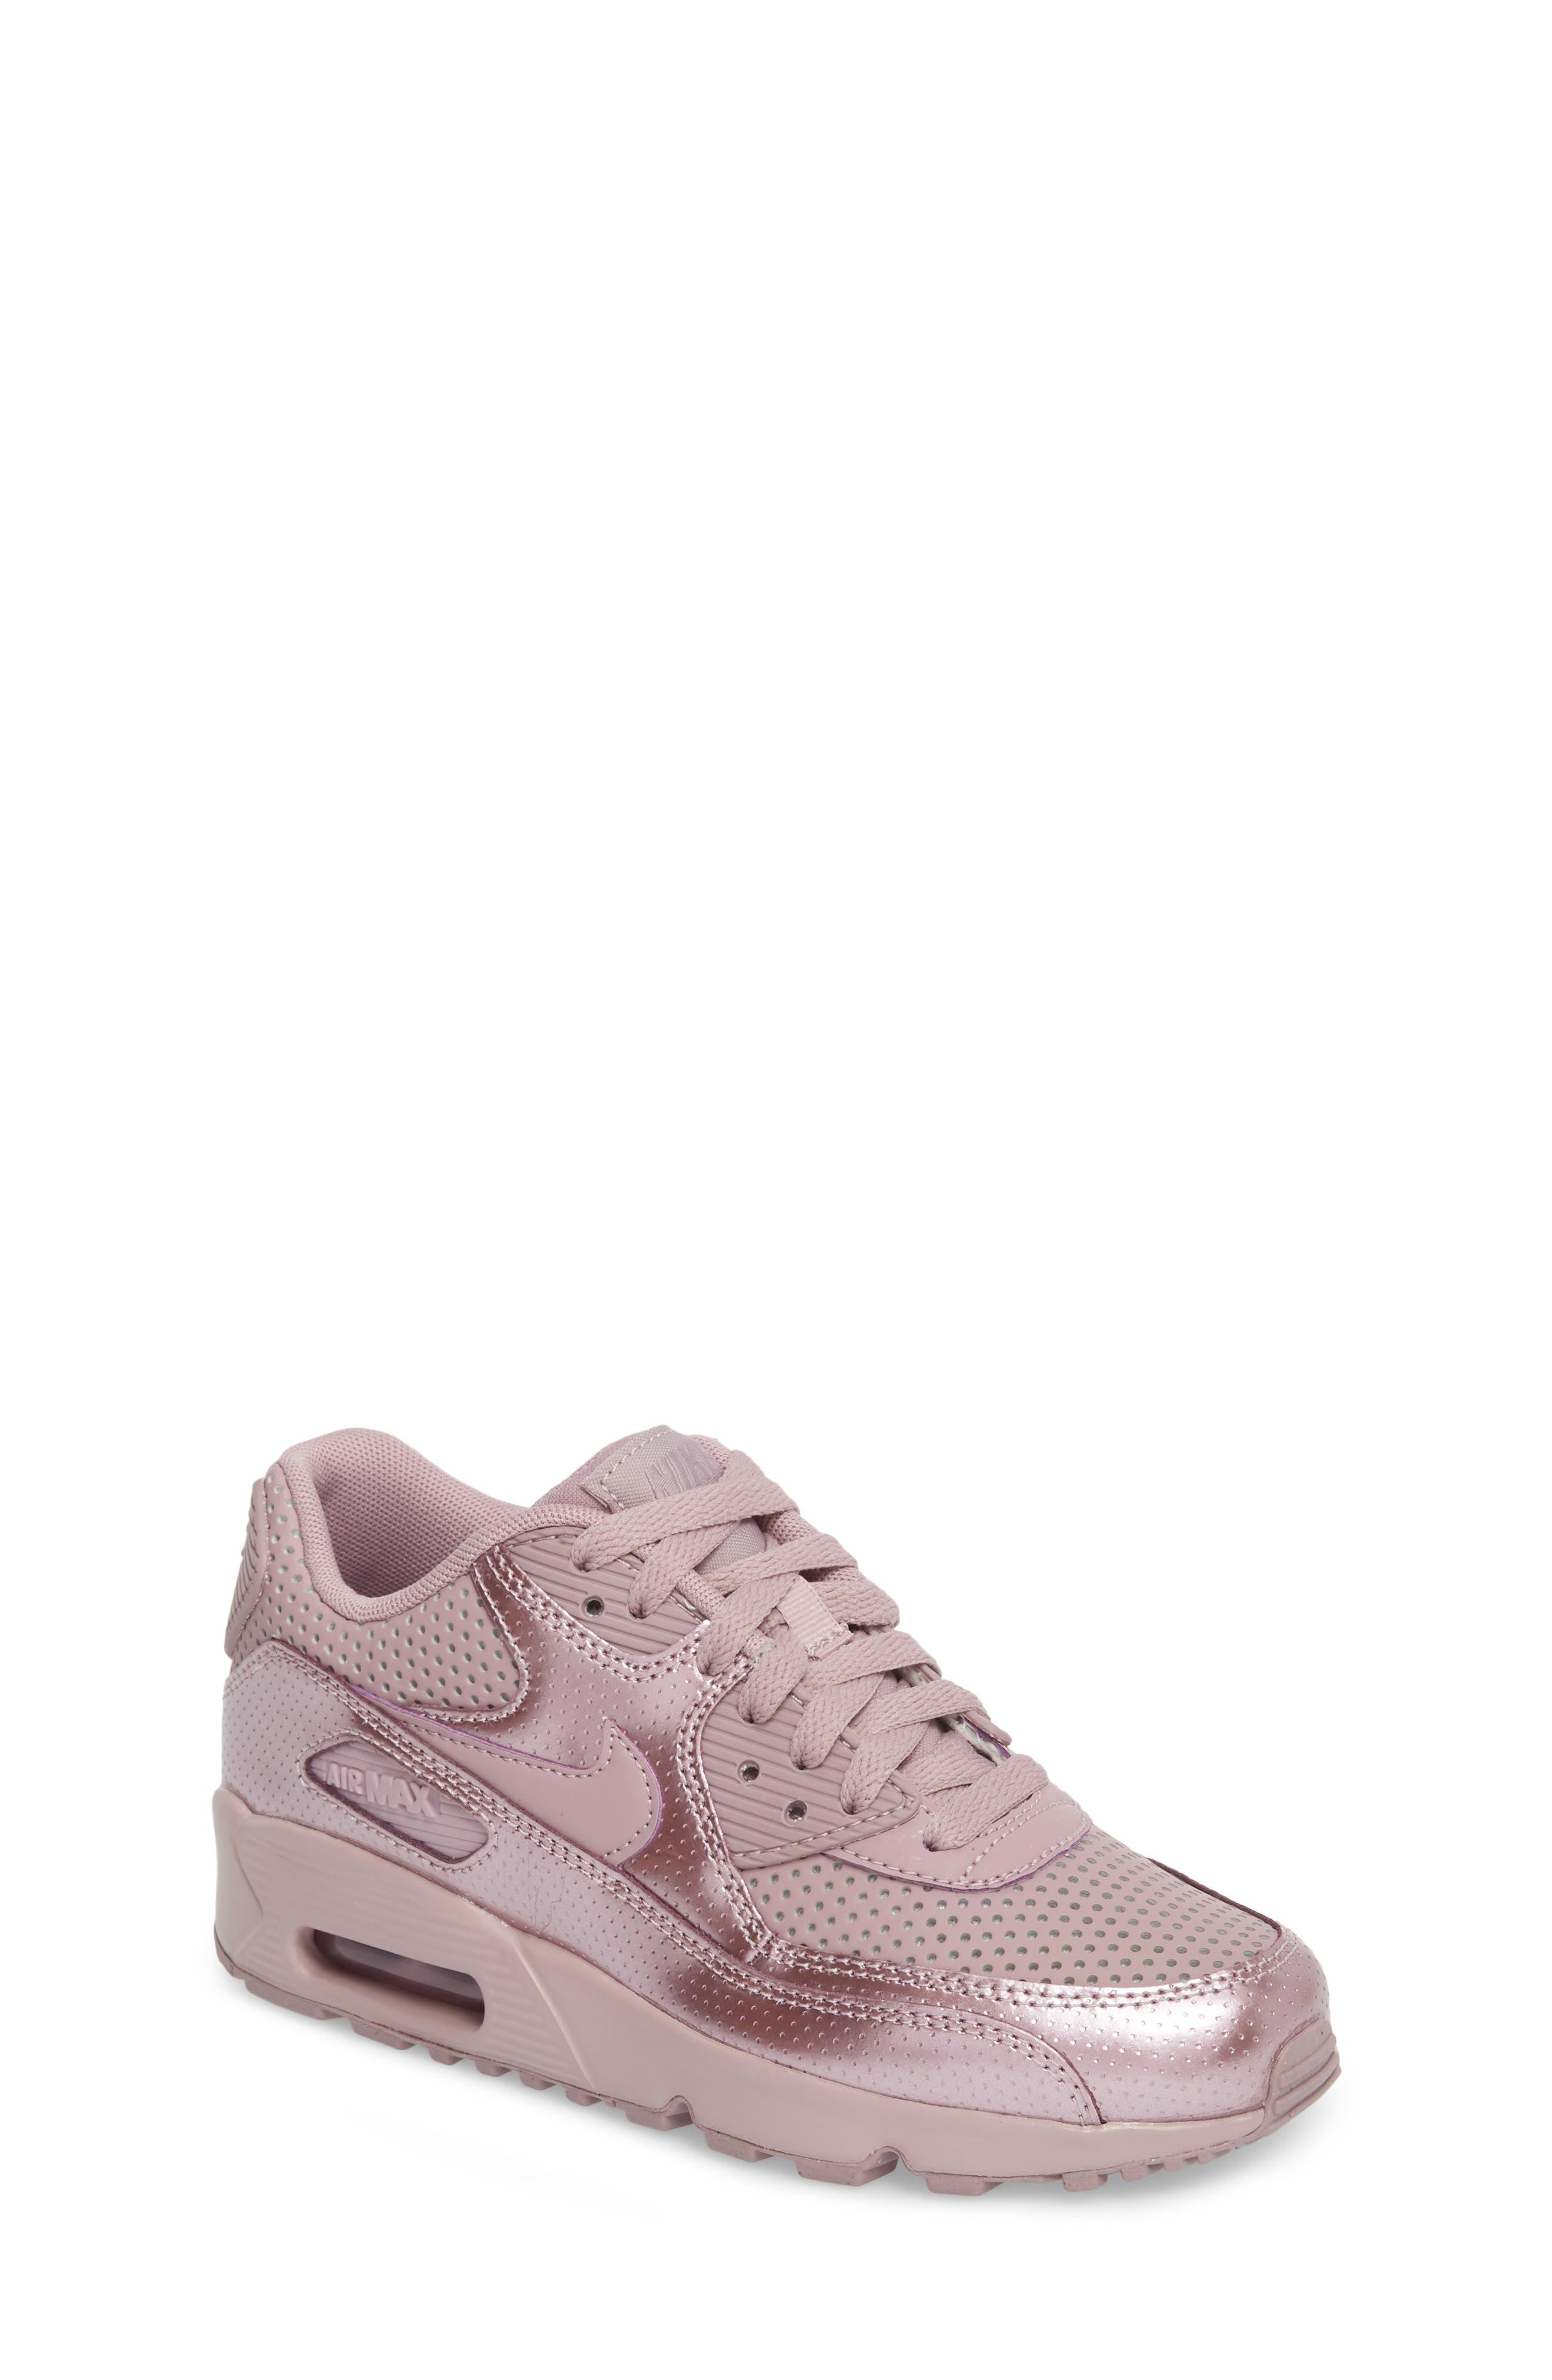 Air Max 90 SE Sneaker,                             Main thumbnail 1, color,